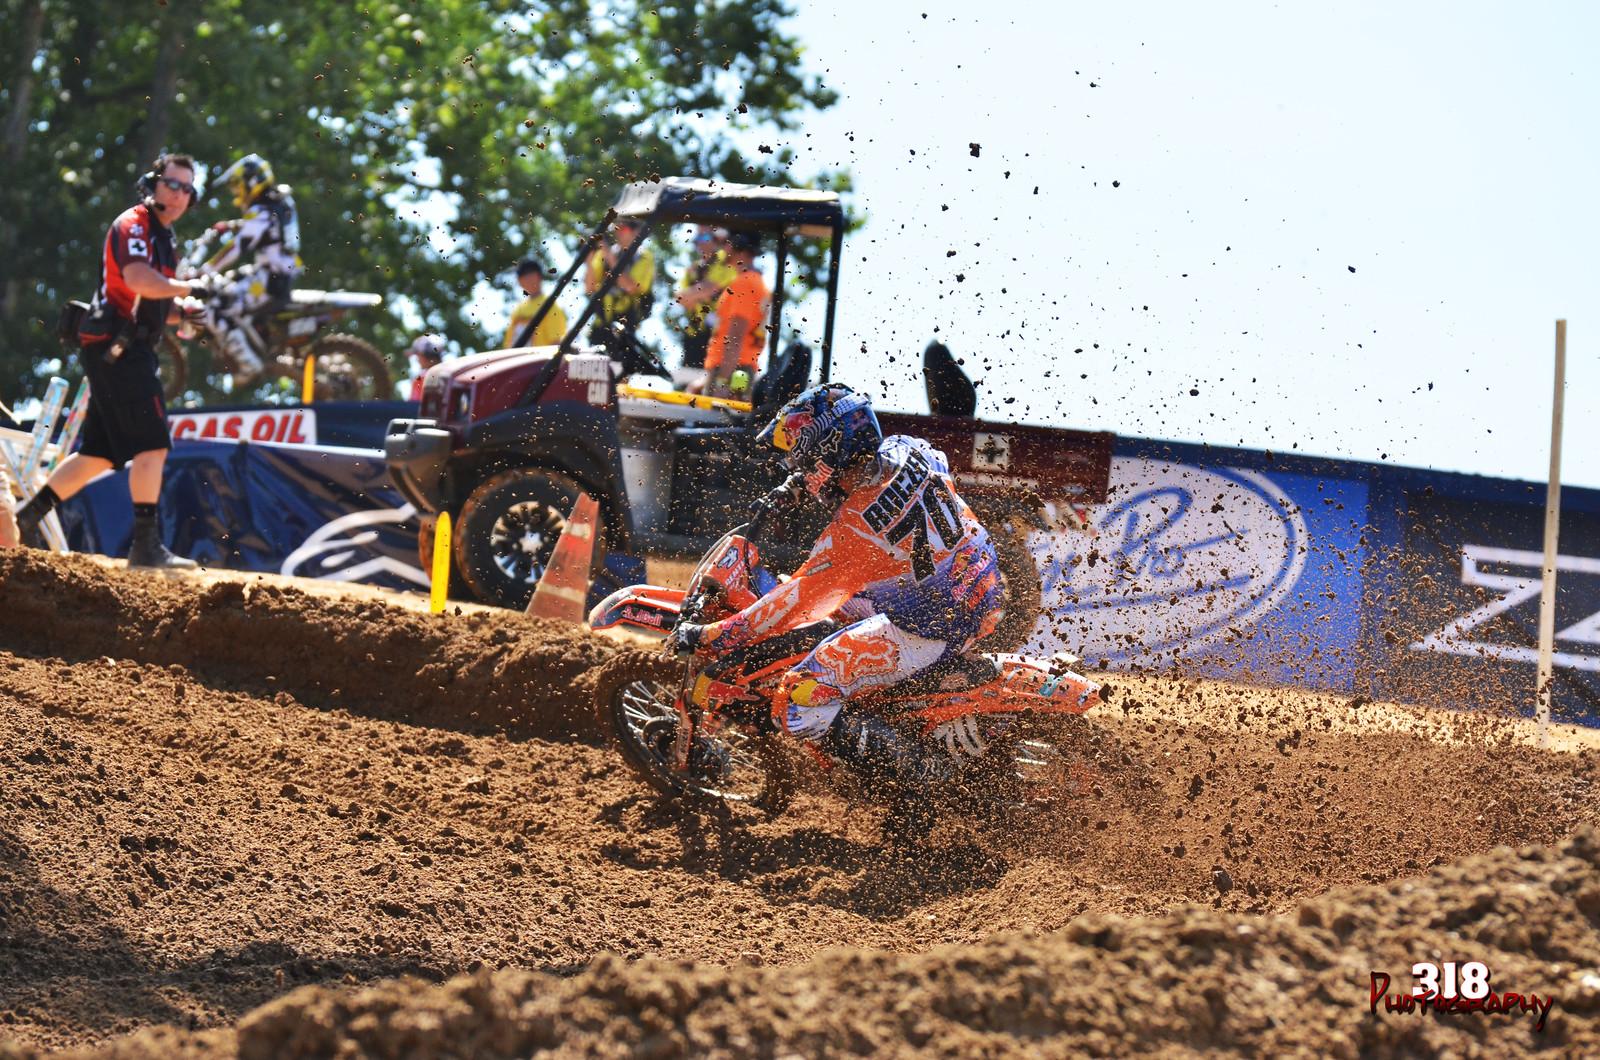 70-03 - MxPro318 - Motocross Pictures - Vital MX